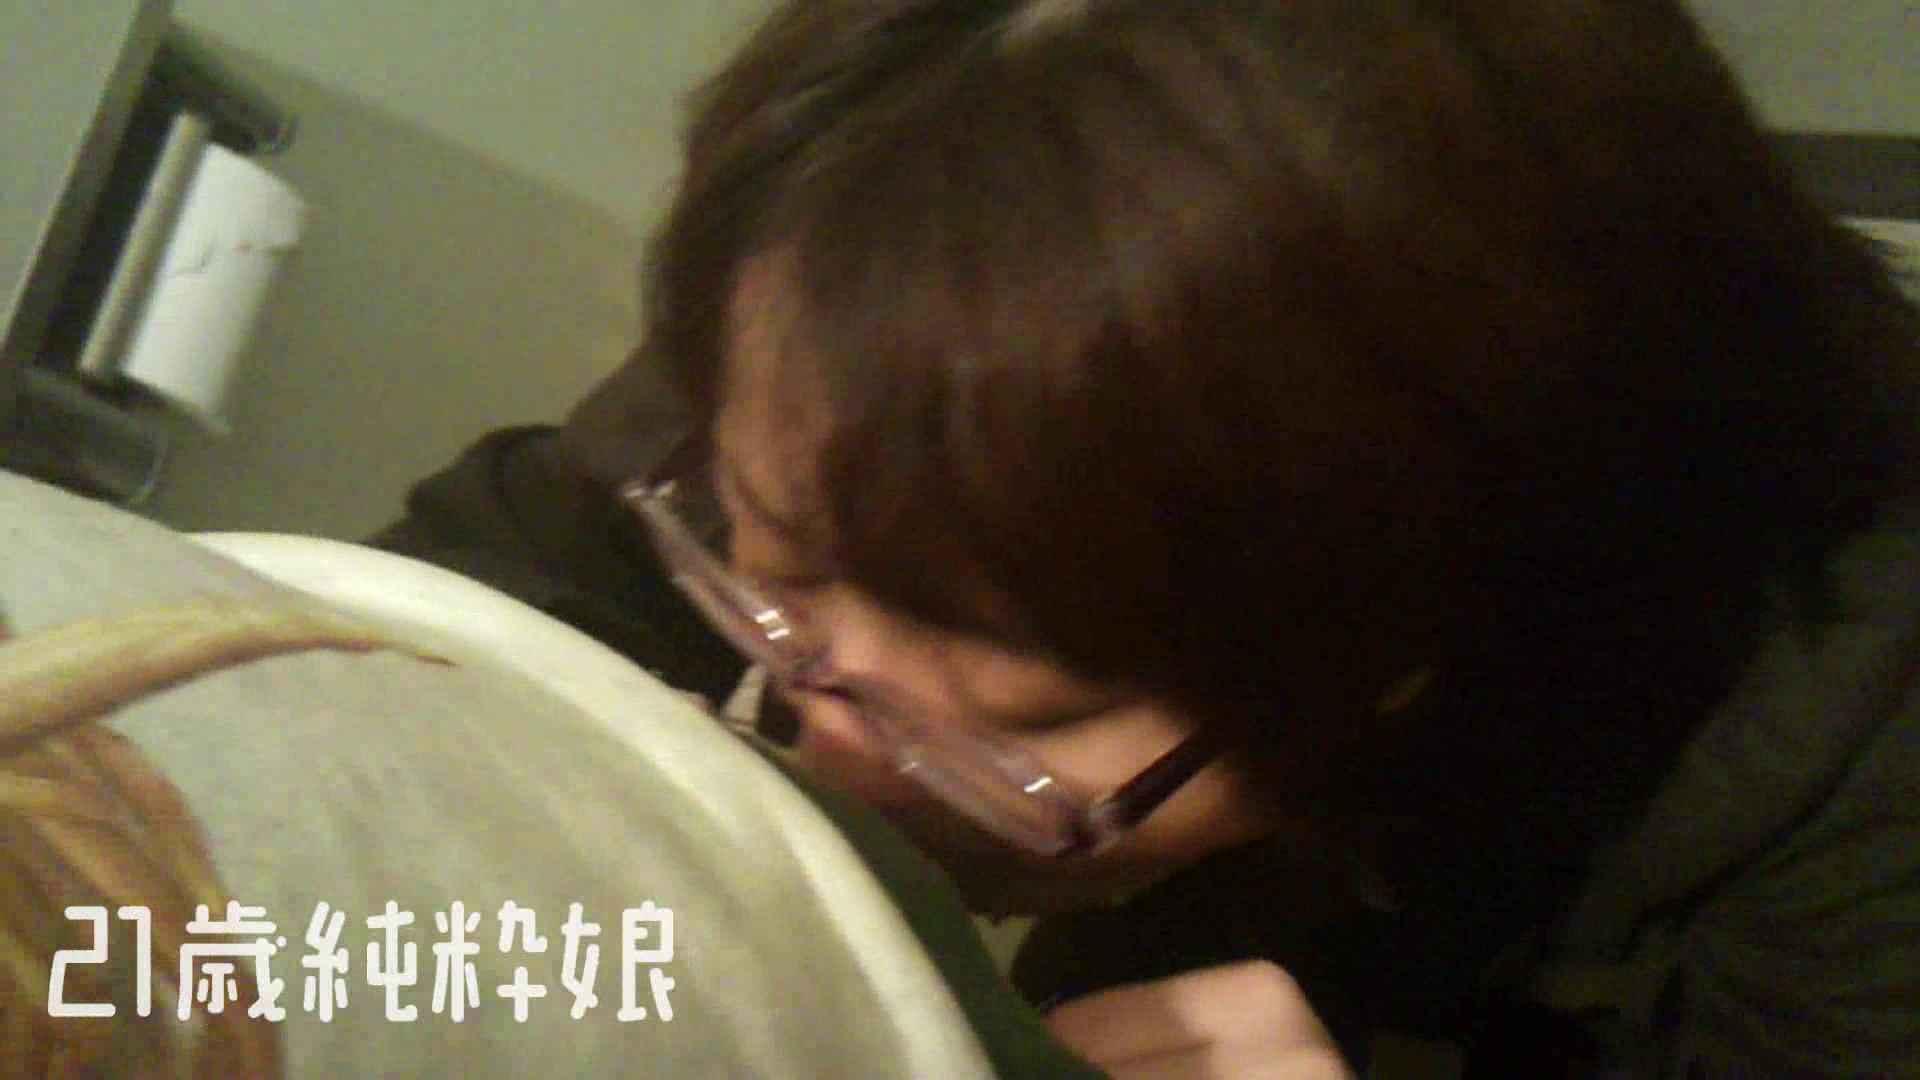 Gカップ21歳純粋嬢第2弾Vol.5 OLヌード天国 | 学校  110PIX 39